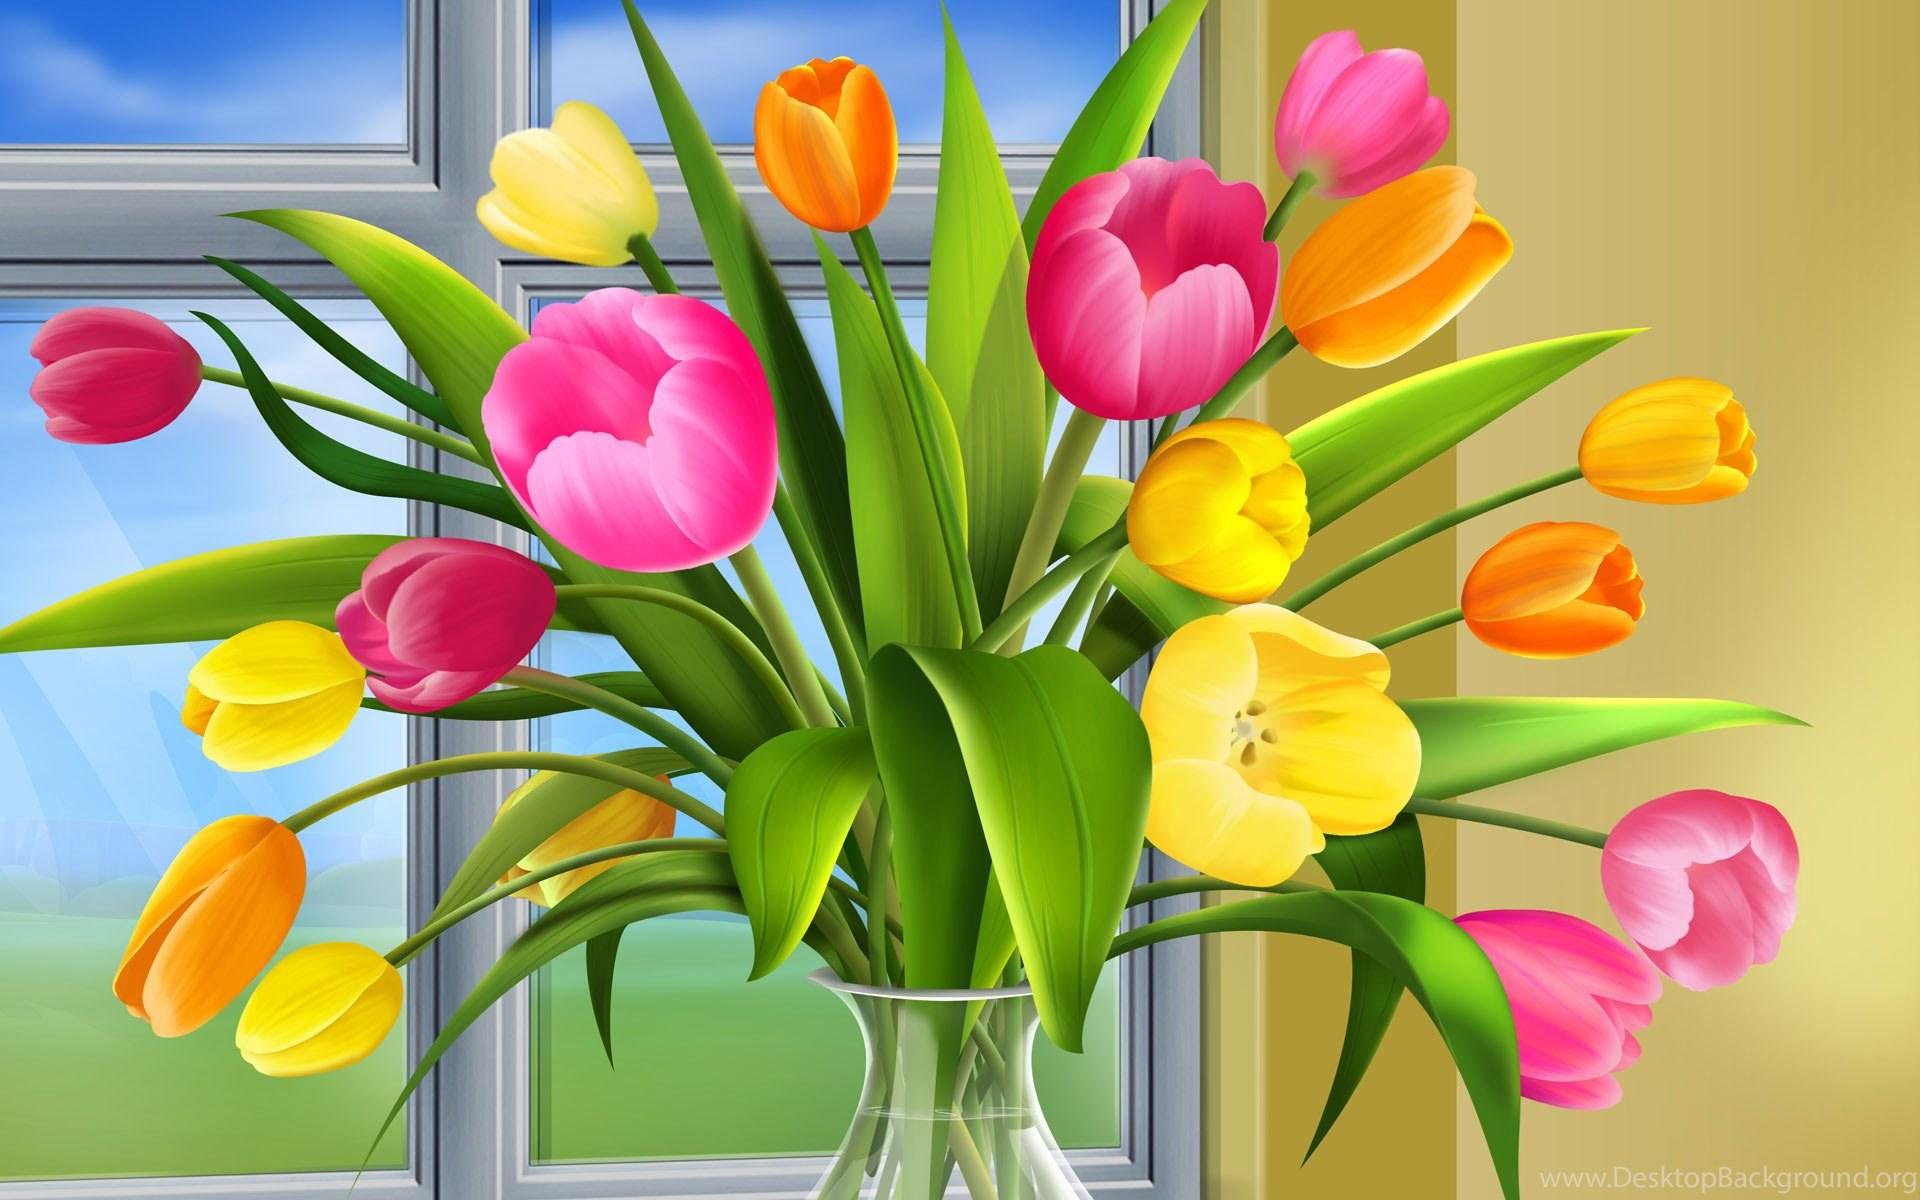 Free Desktop Wallpapers Spring Flowers Desktop Background